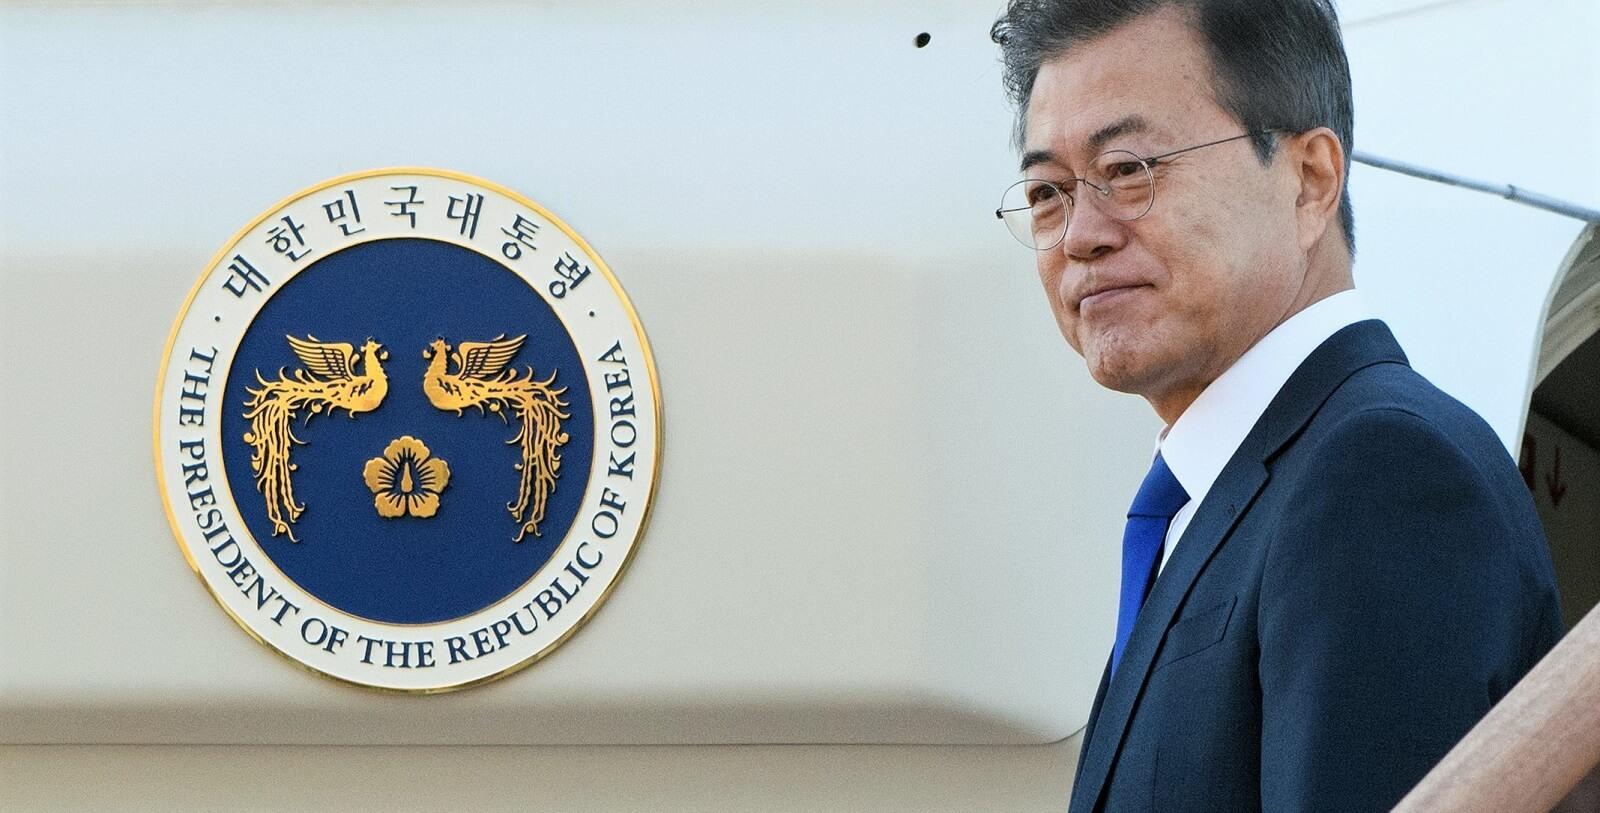 South Korean President Moon Jae-in, 9 May 2018 (Photo: Republic of Korea/Flickr)